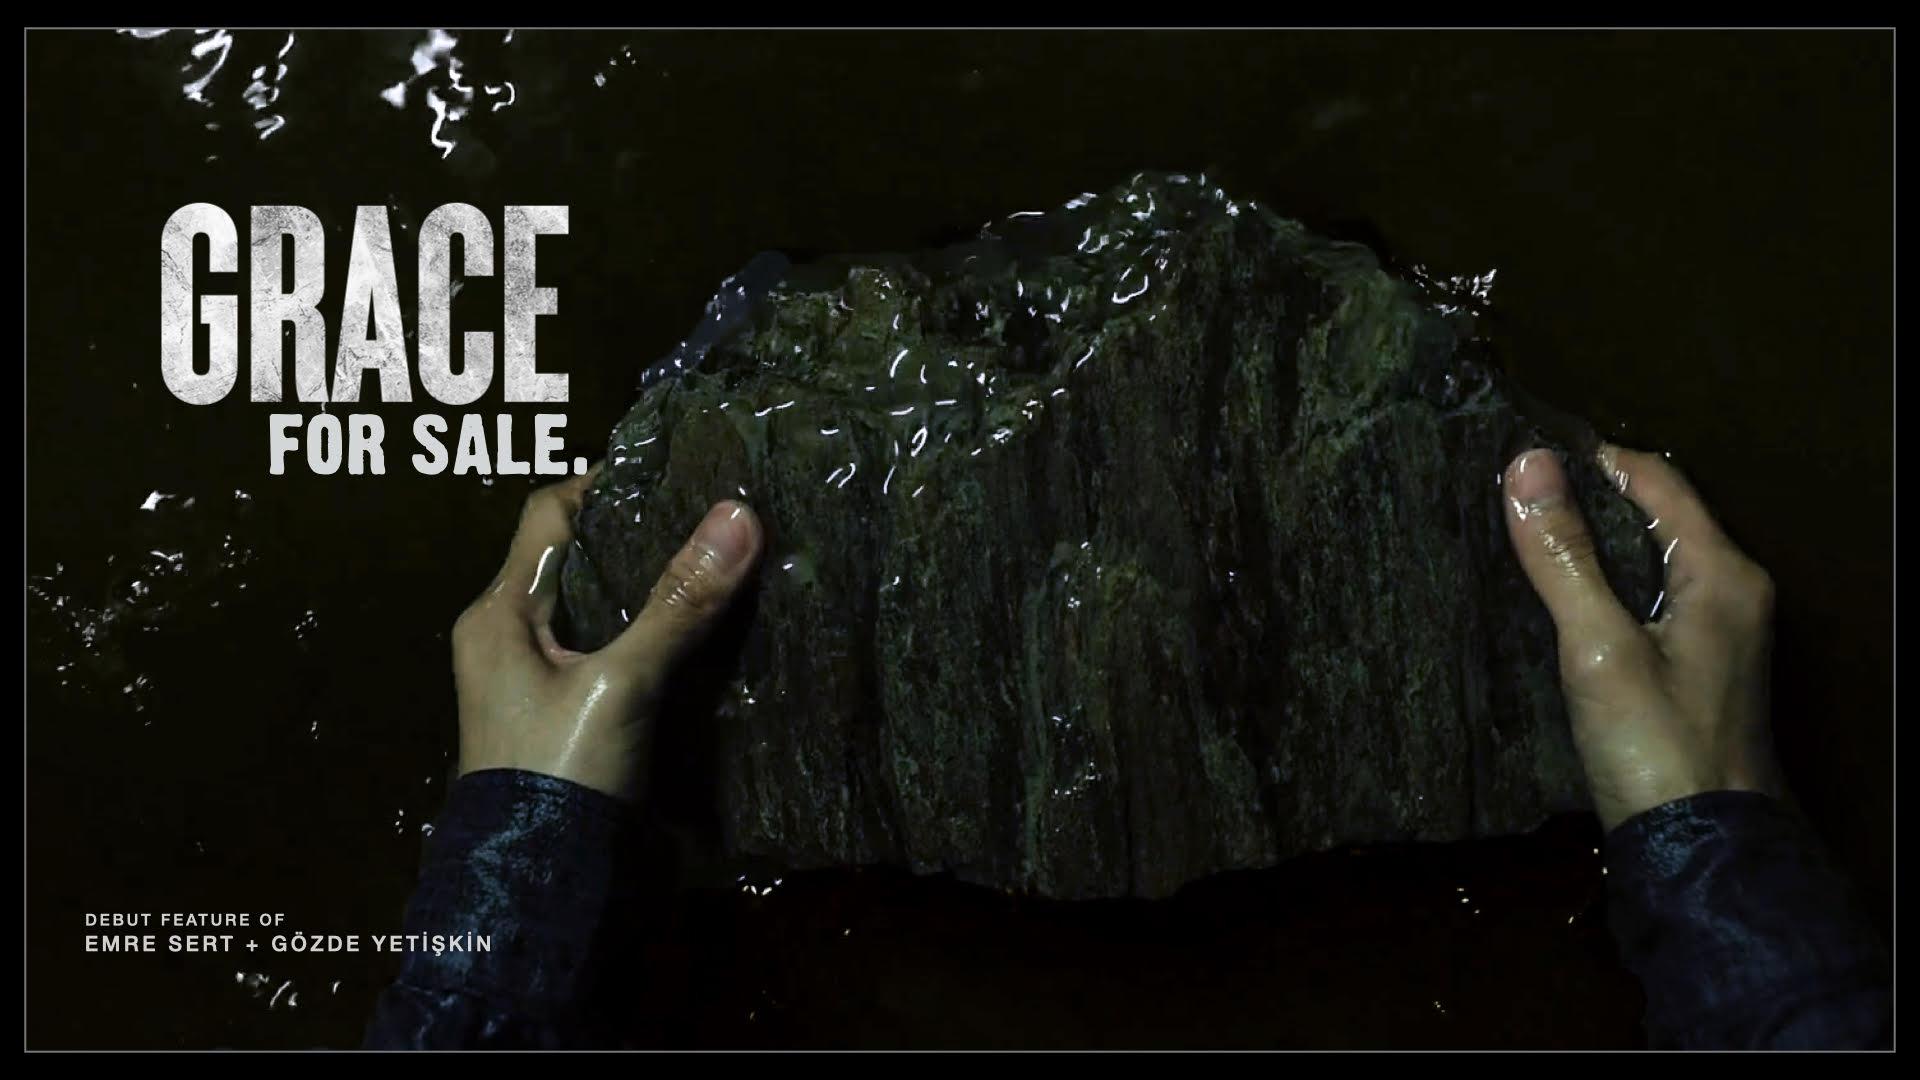 """Grace For Sale"" won TRT awards"